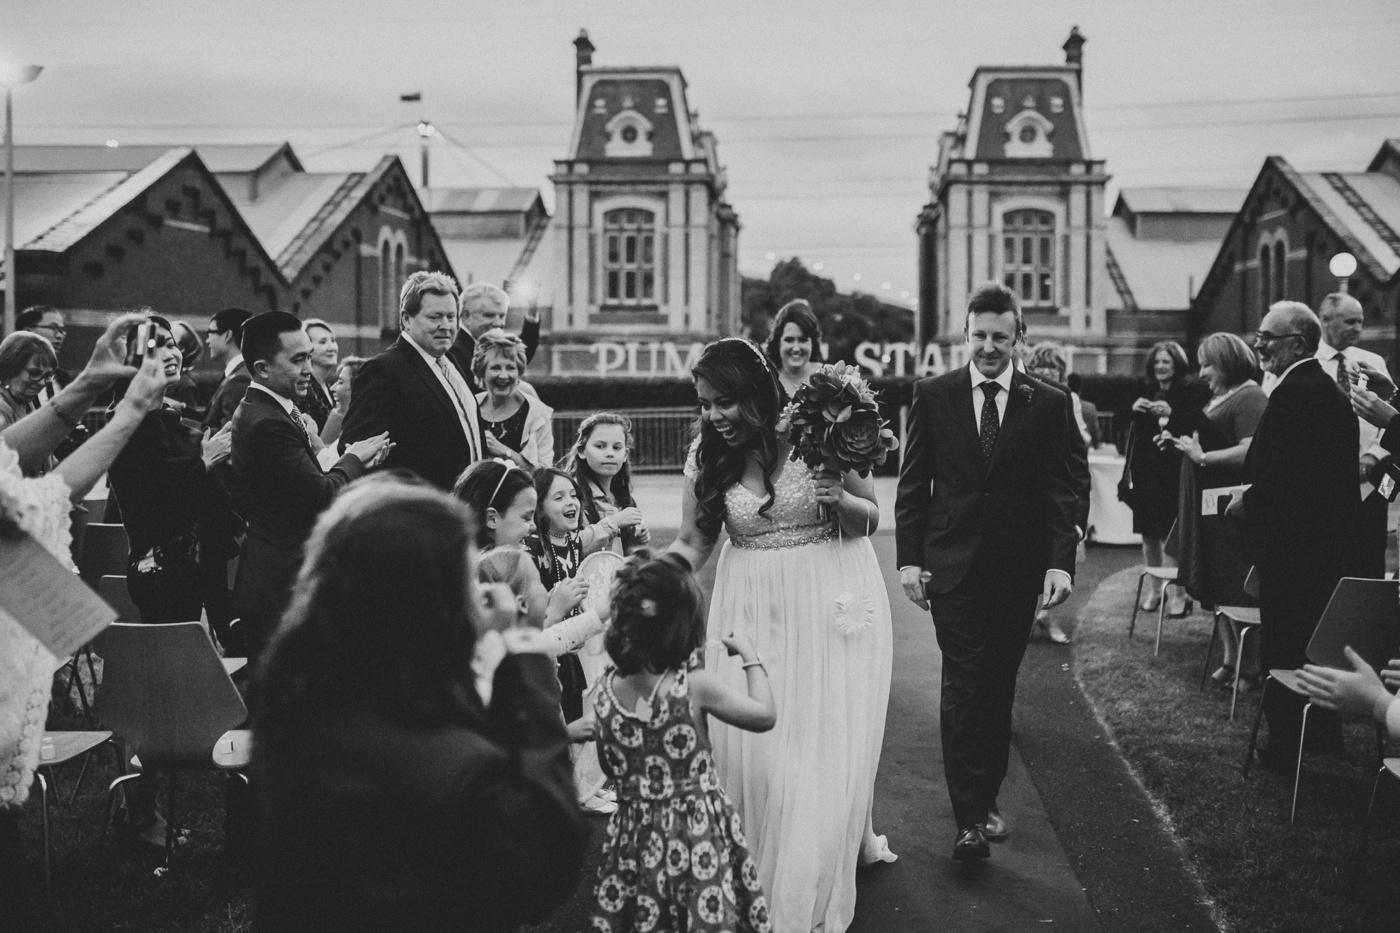 anitadaniel_melbourne-scienceworks-relaxed-fun-geek-wedding_melbourne-candid-wedding-photography_52